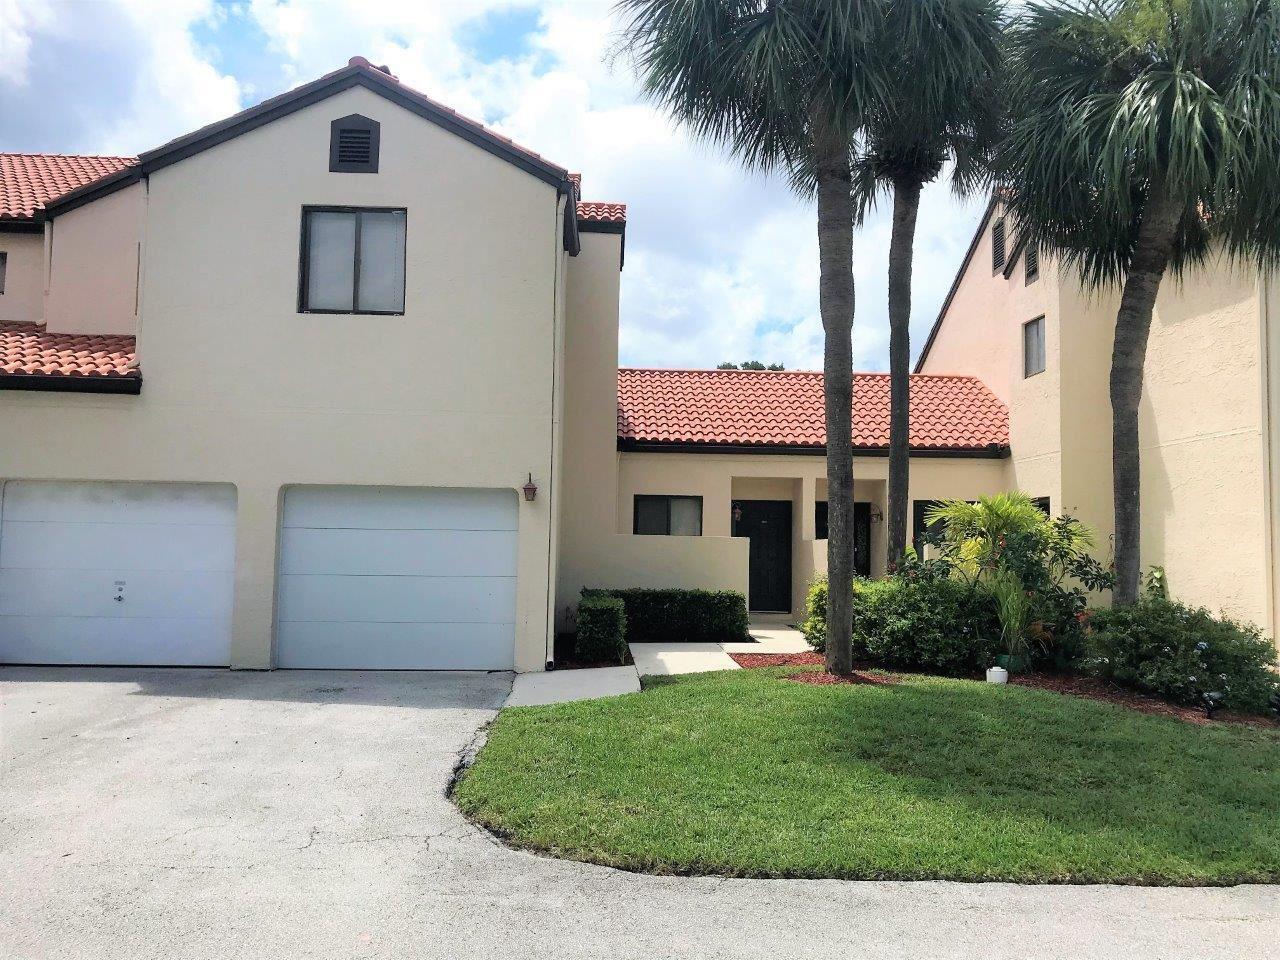 20 Via De Casas Sur #102, Boynton Beach, FL 33426 - MLS#: RX-10732152